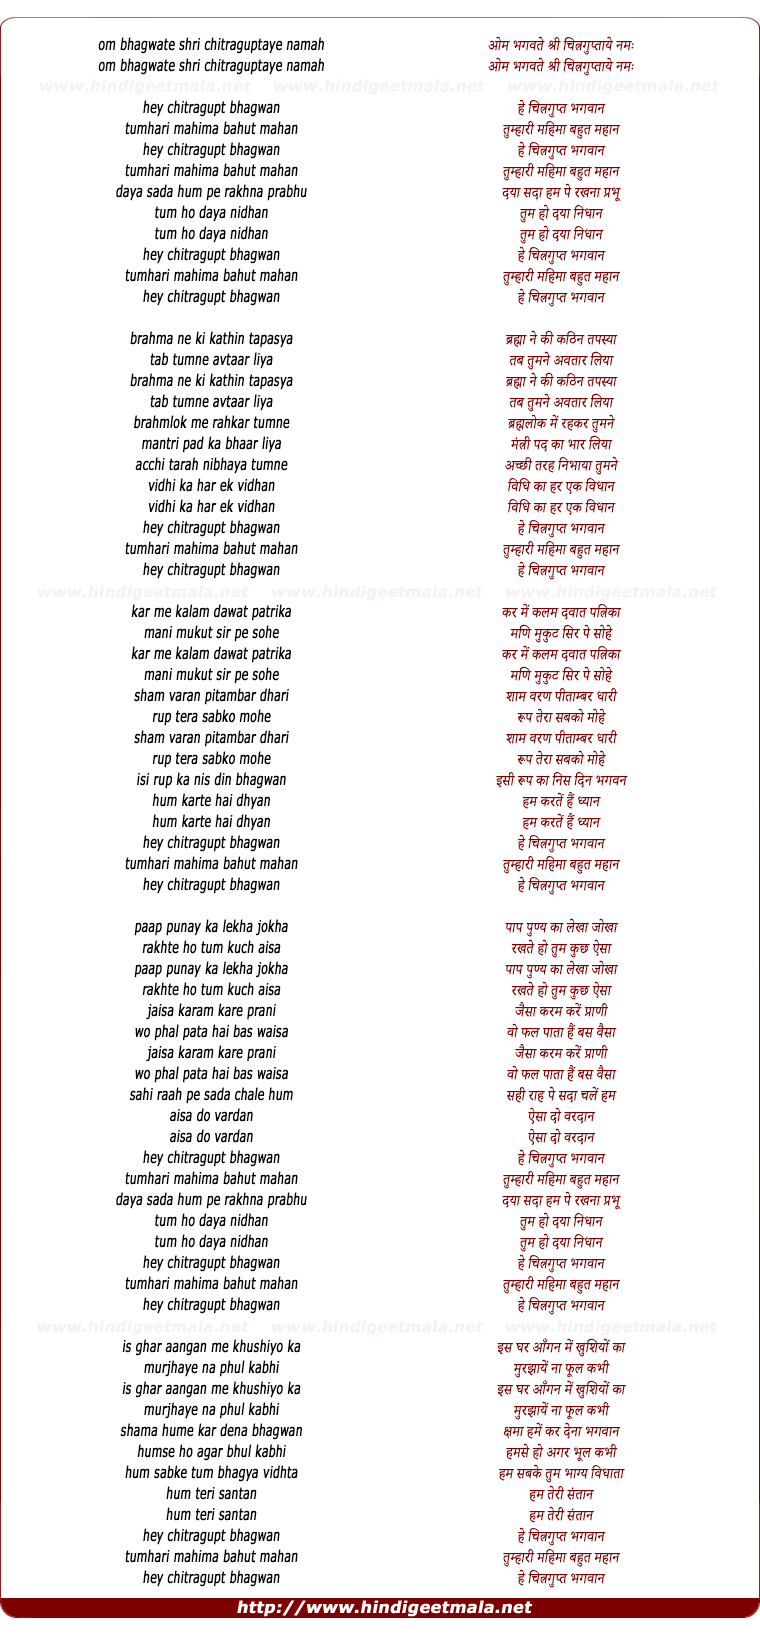 lyrics of song He Chitragupt Bhagwan